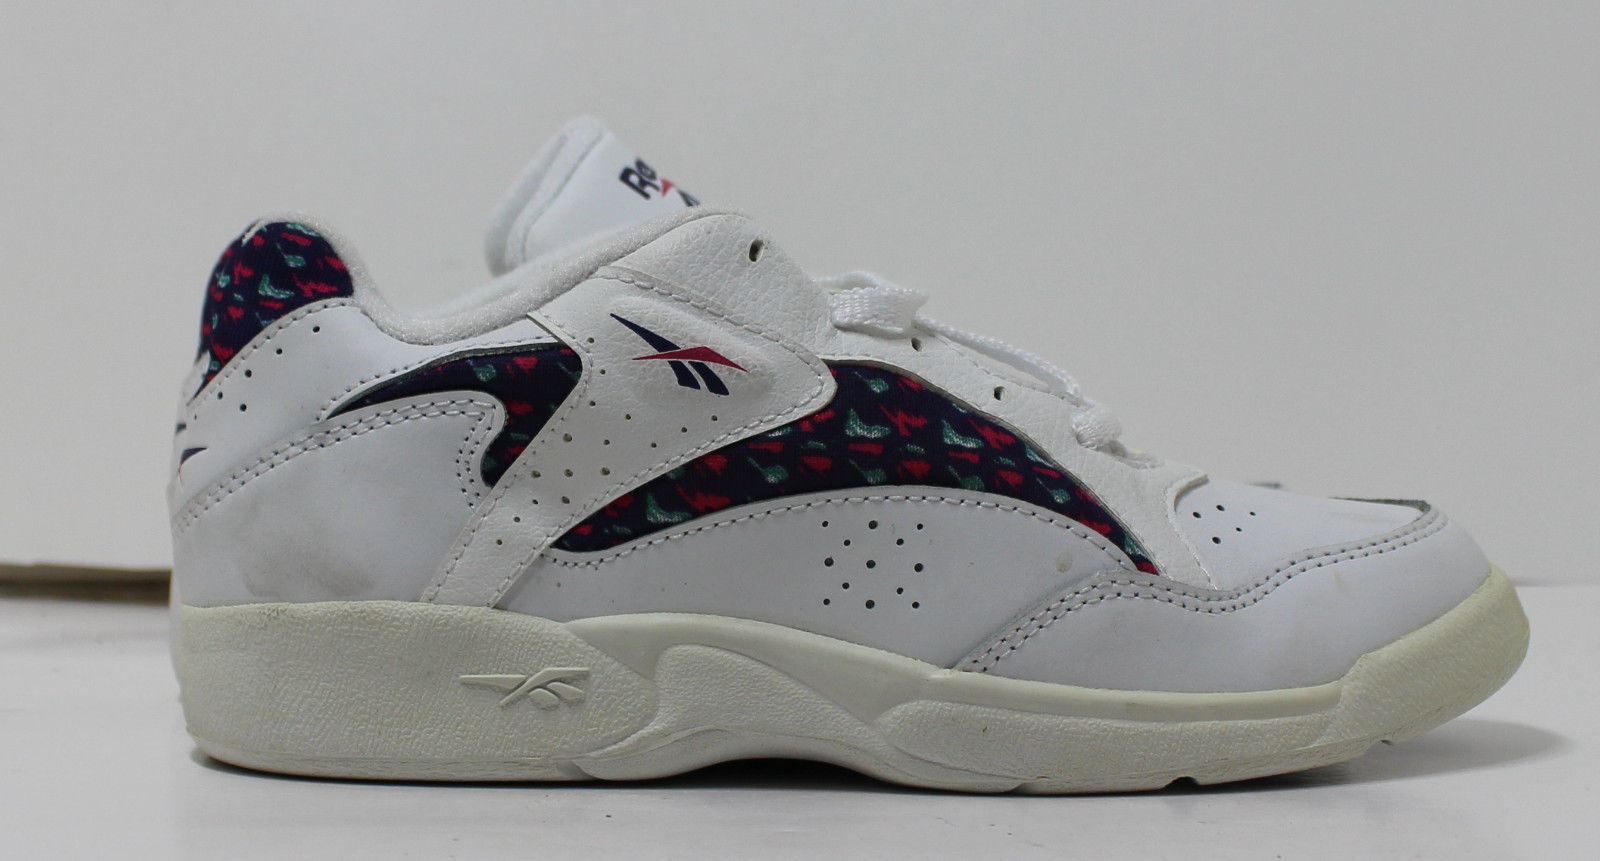 f69b27ea1dd6a Reebok Girls 1990s Vintage Sneakers White 2.5 Calypso Low 72-35318